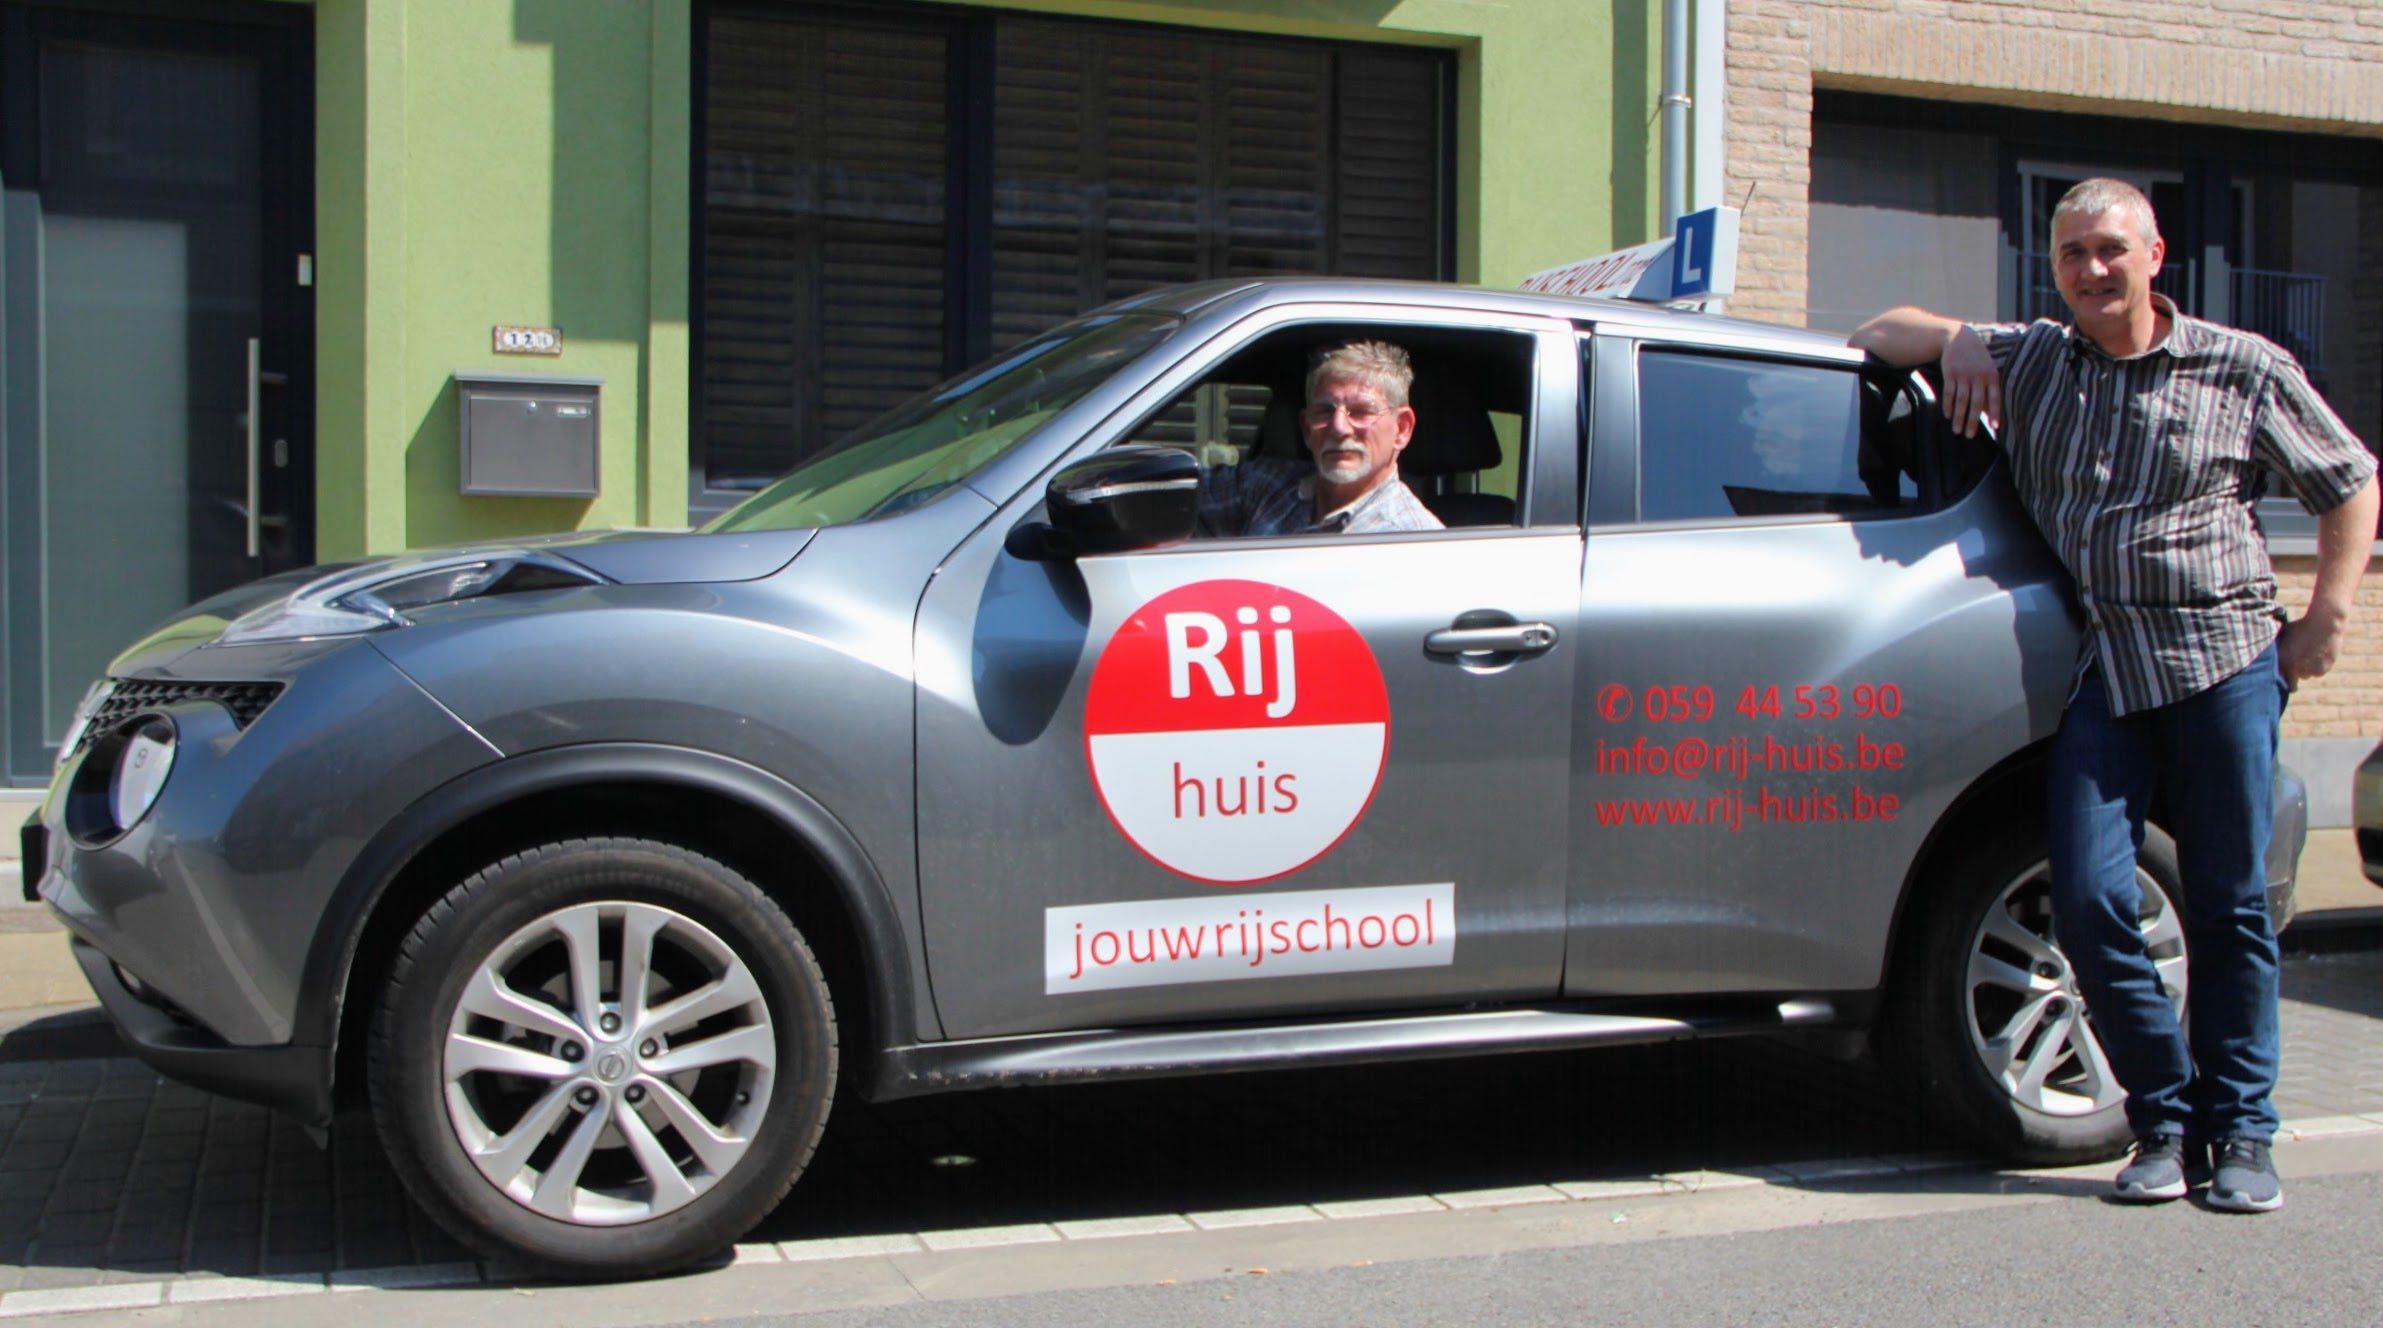 sponsor RIJ HUIS